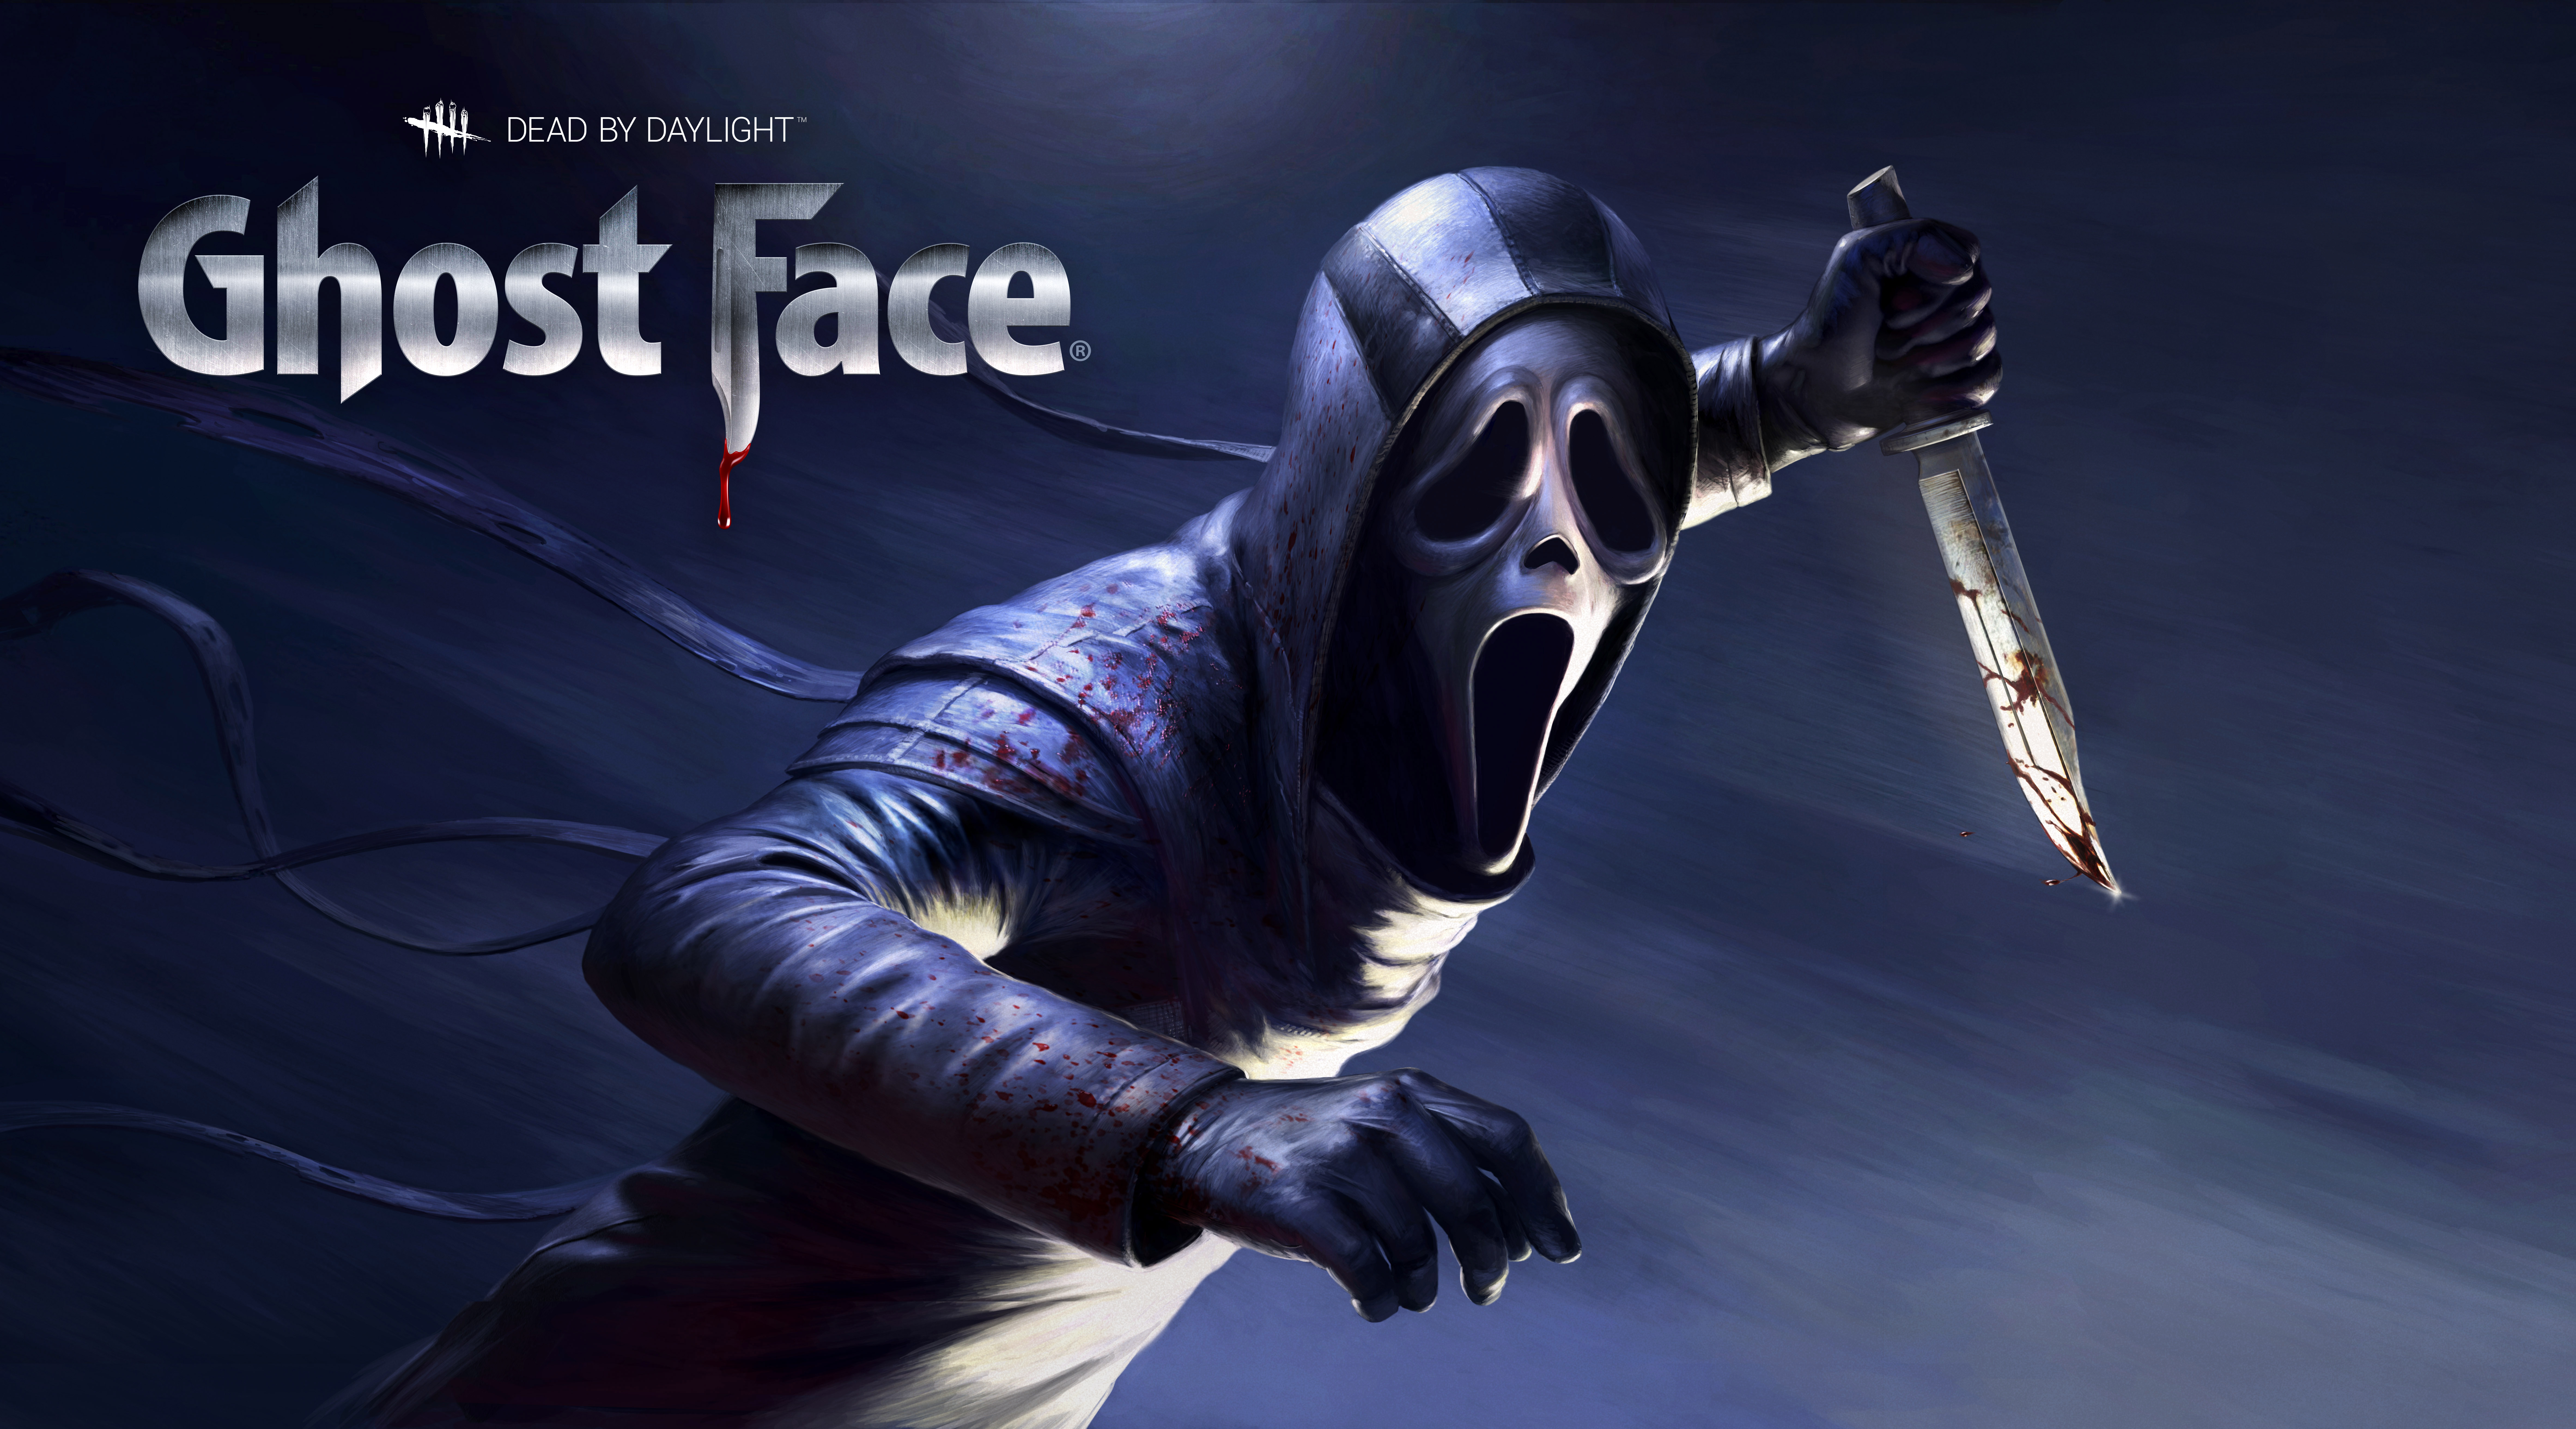 DBD_Ghostface_KeyArt_Fwlogo.jpg